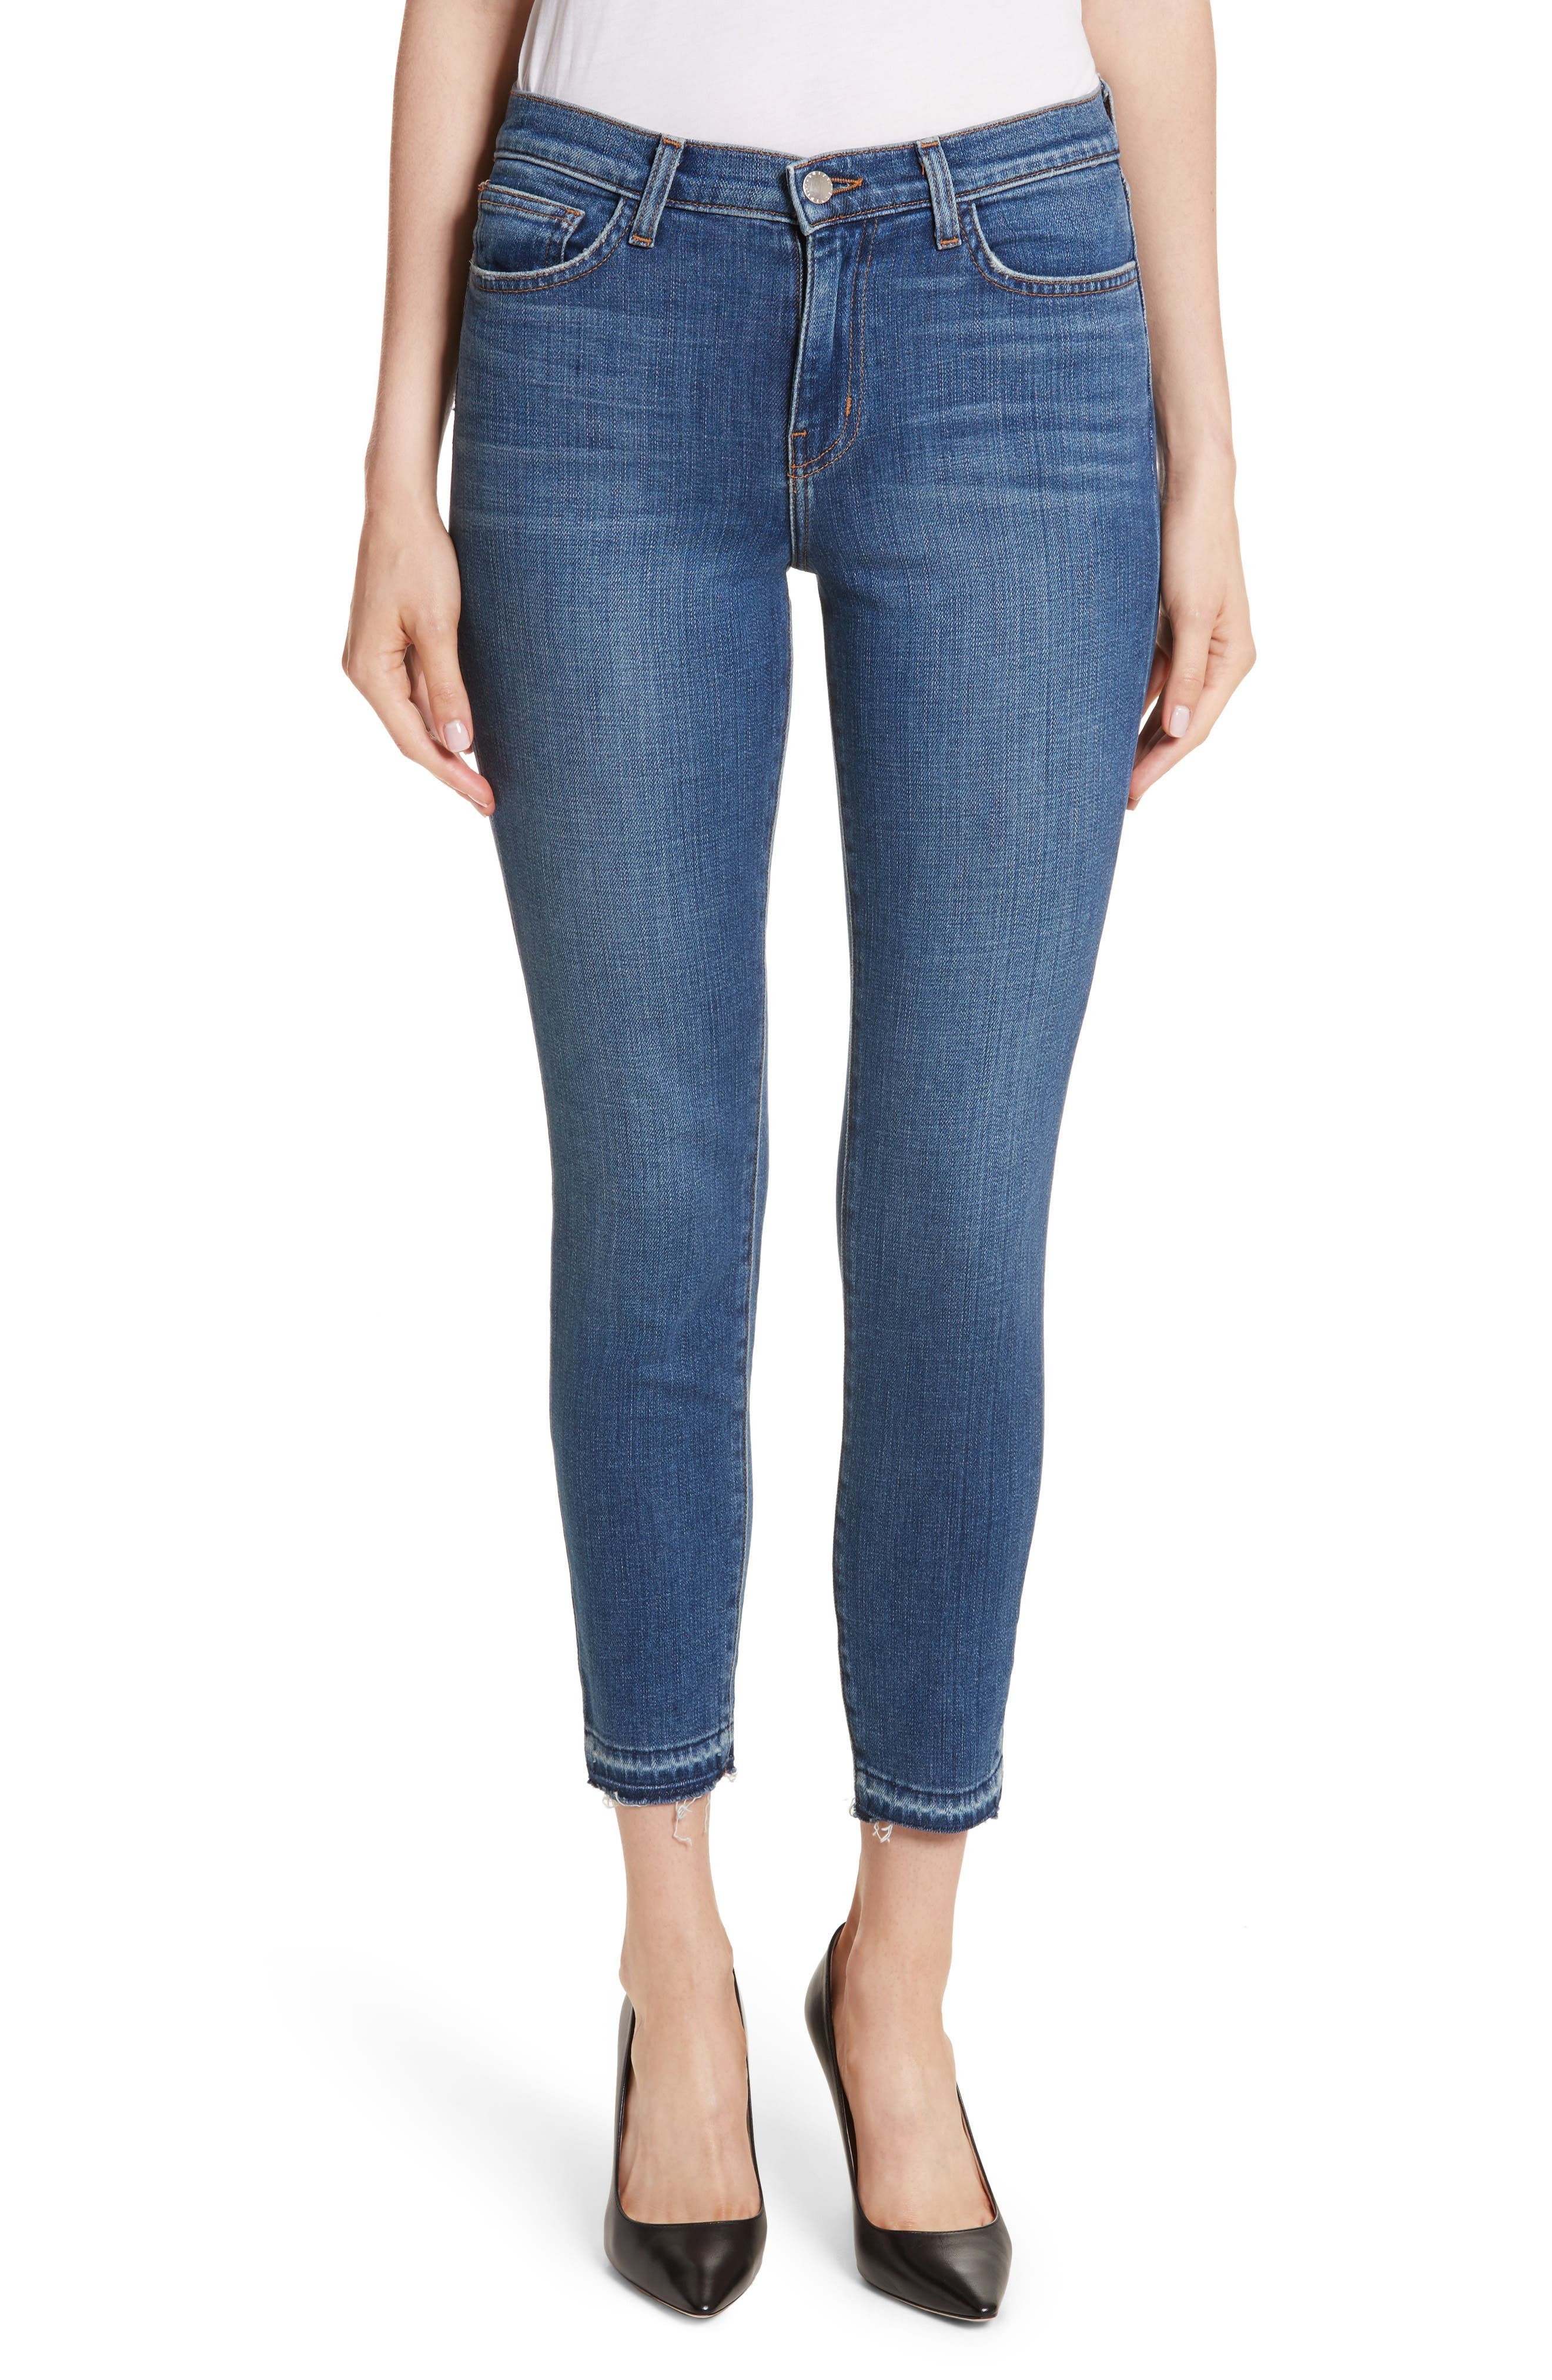 Main Image - L'AGENCE Laguna French High Waist Release Hem Jeans